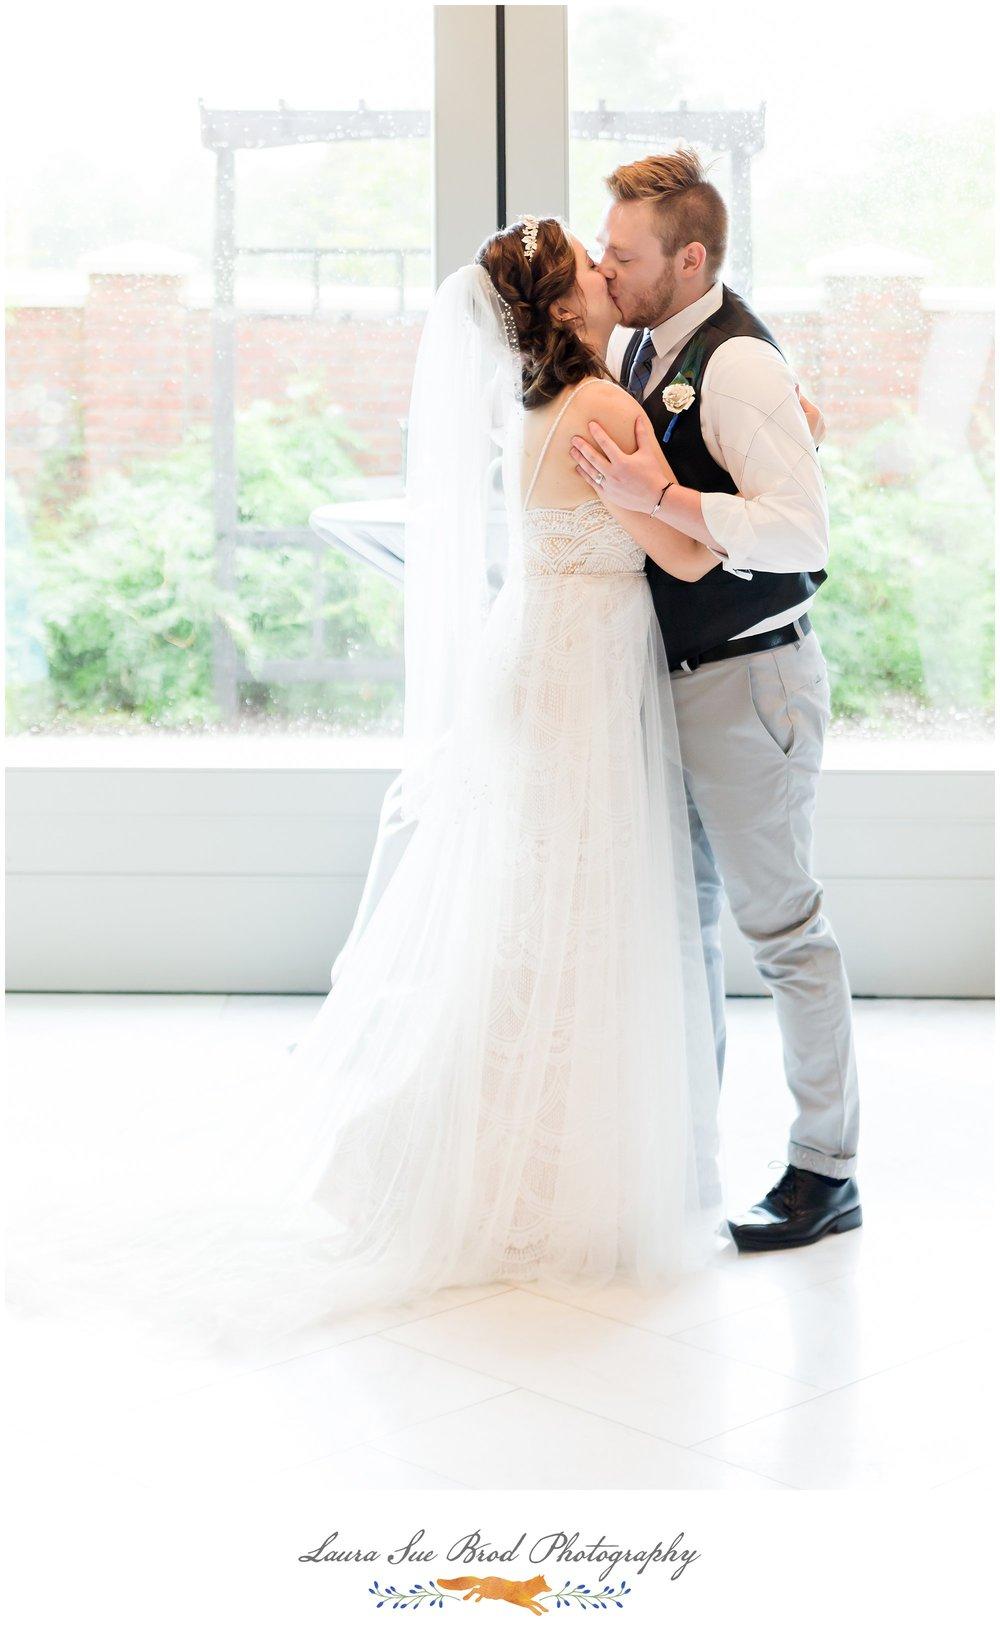 wr.Norfolk Wedding - VanBruggen - 3680.jpgNorfolk VA Wedding - The Van Bruggens - Laura Sue Brod Photography